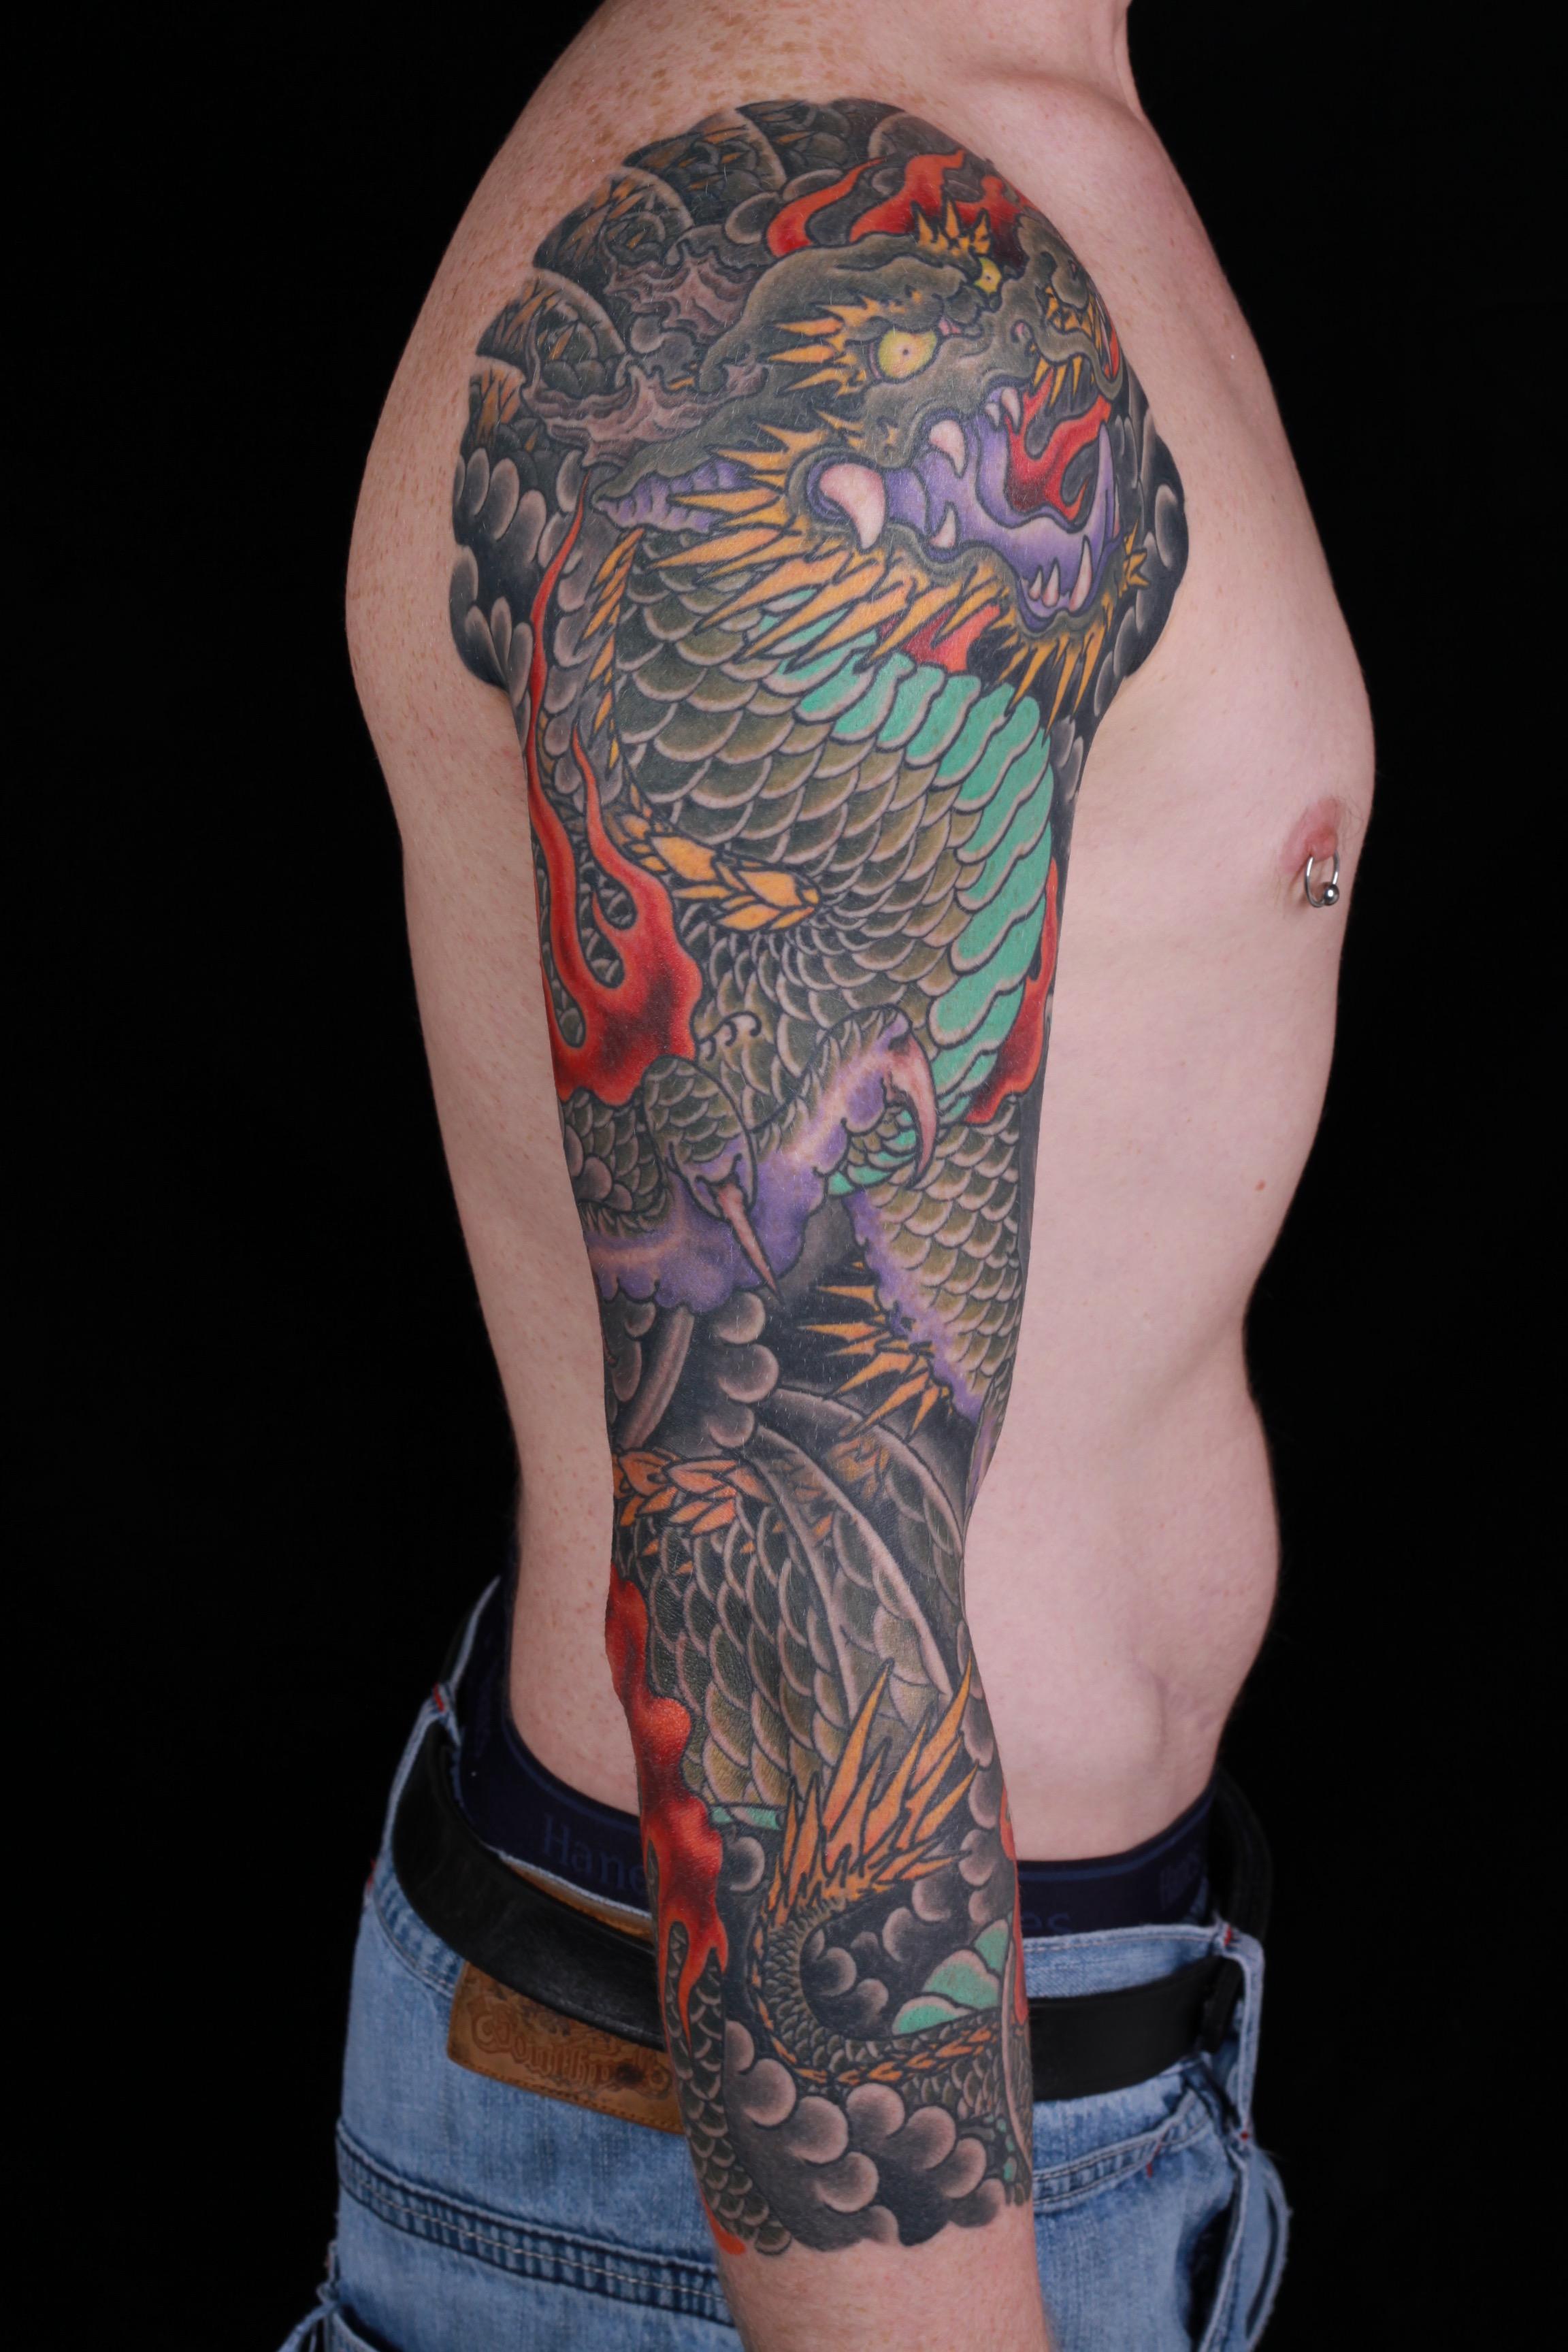 Dedication Tattoo